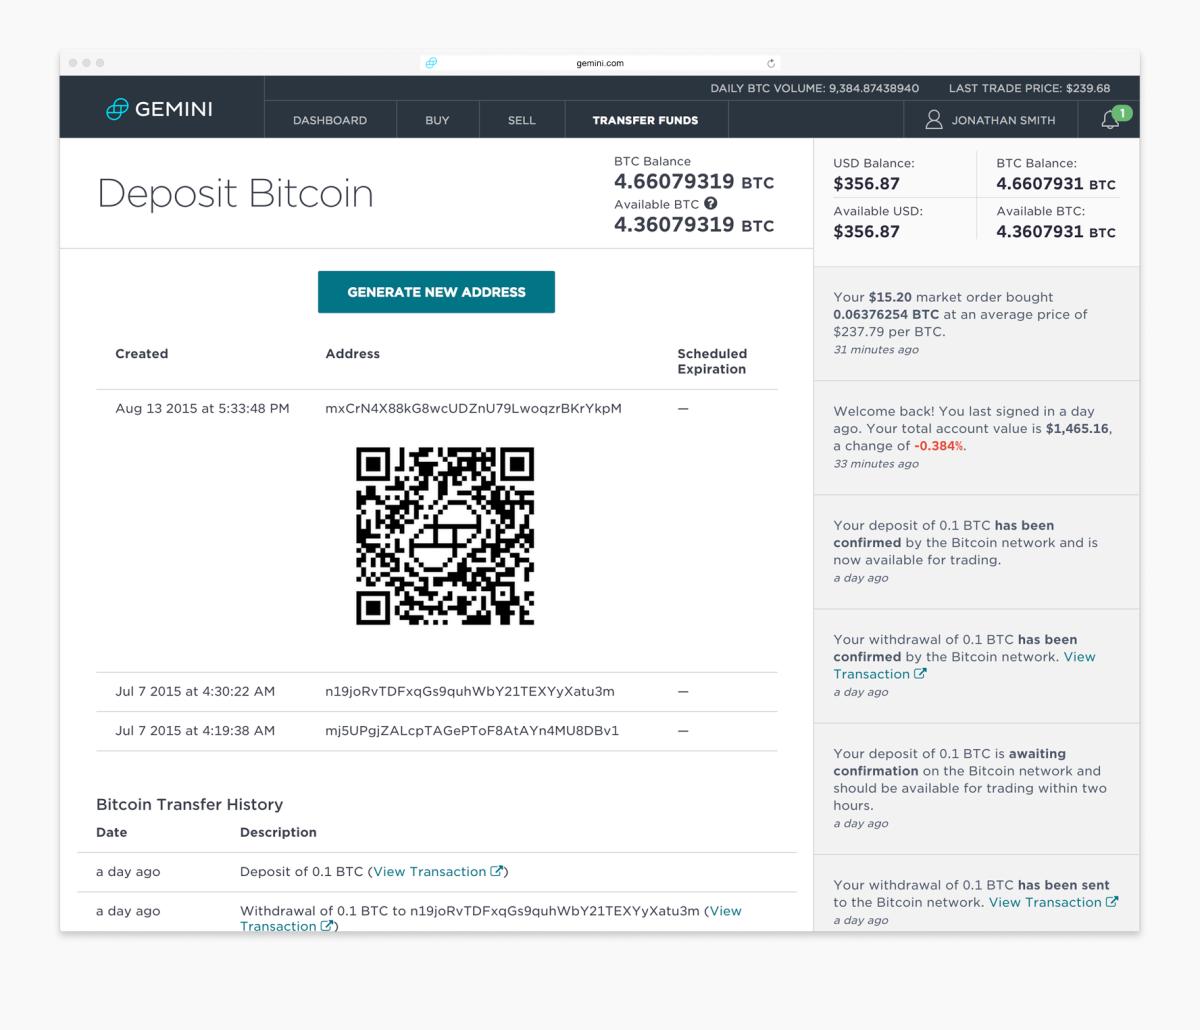 Gemini - Bitcoin